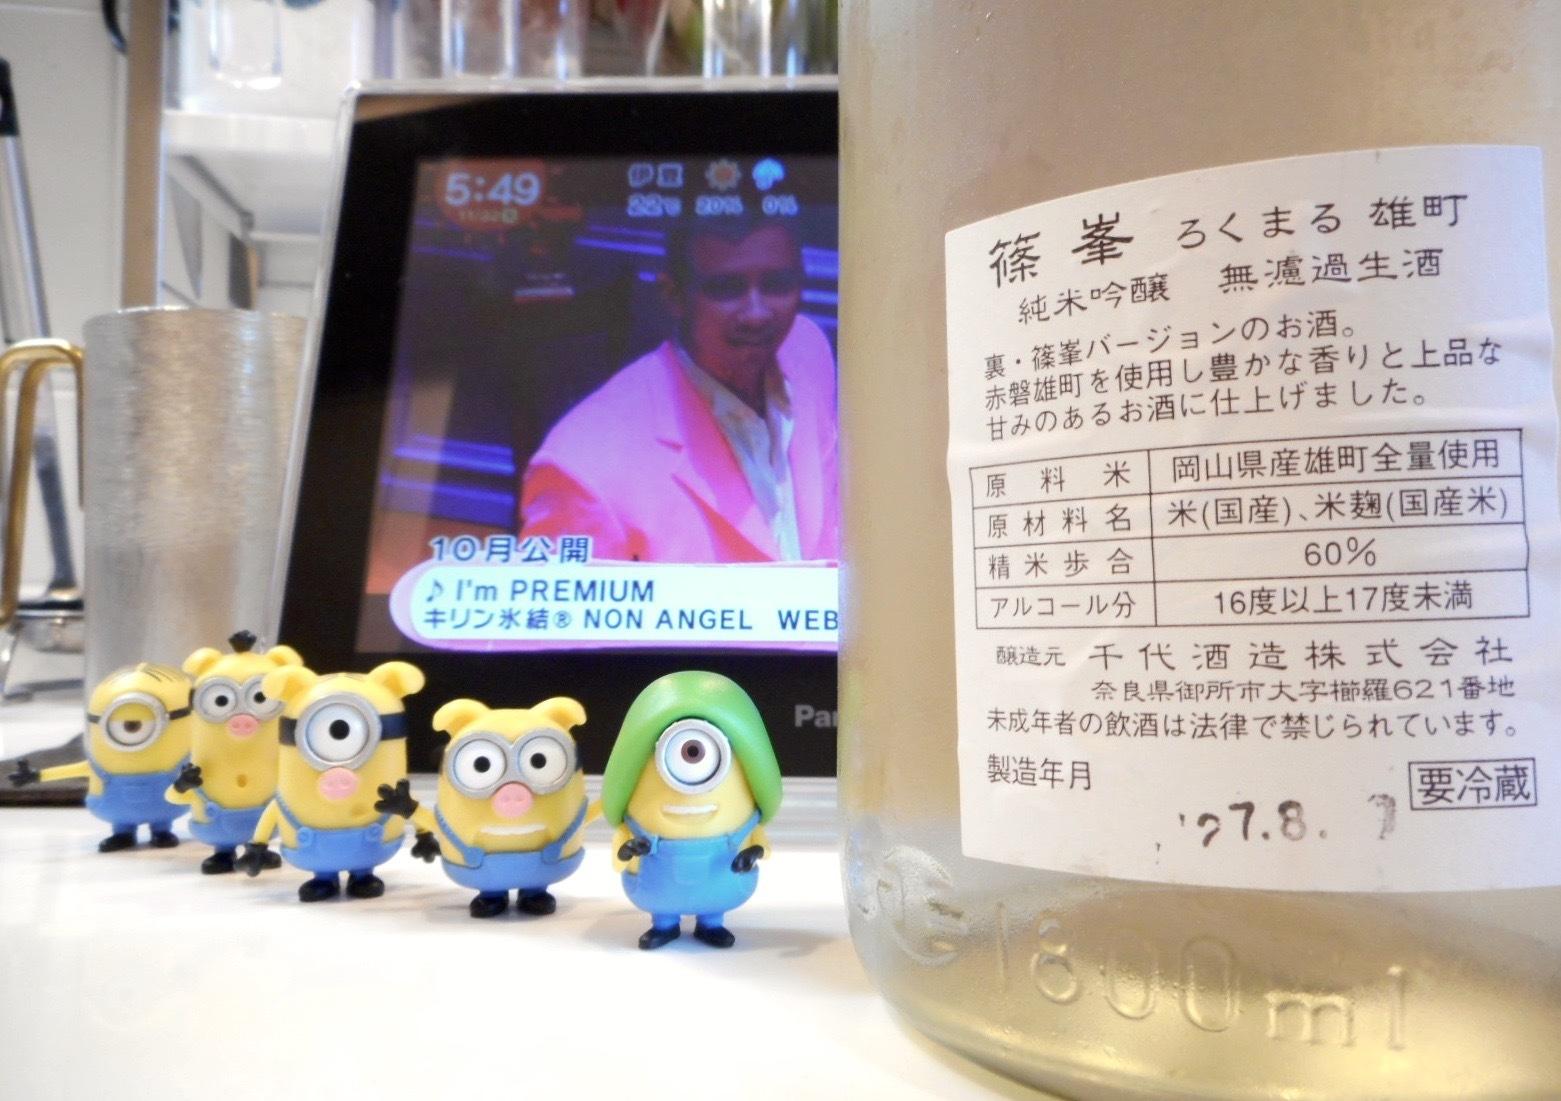 rokumaru_omachi26by3.jpg